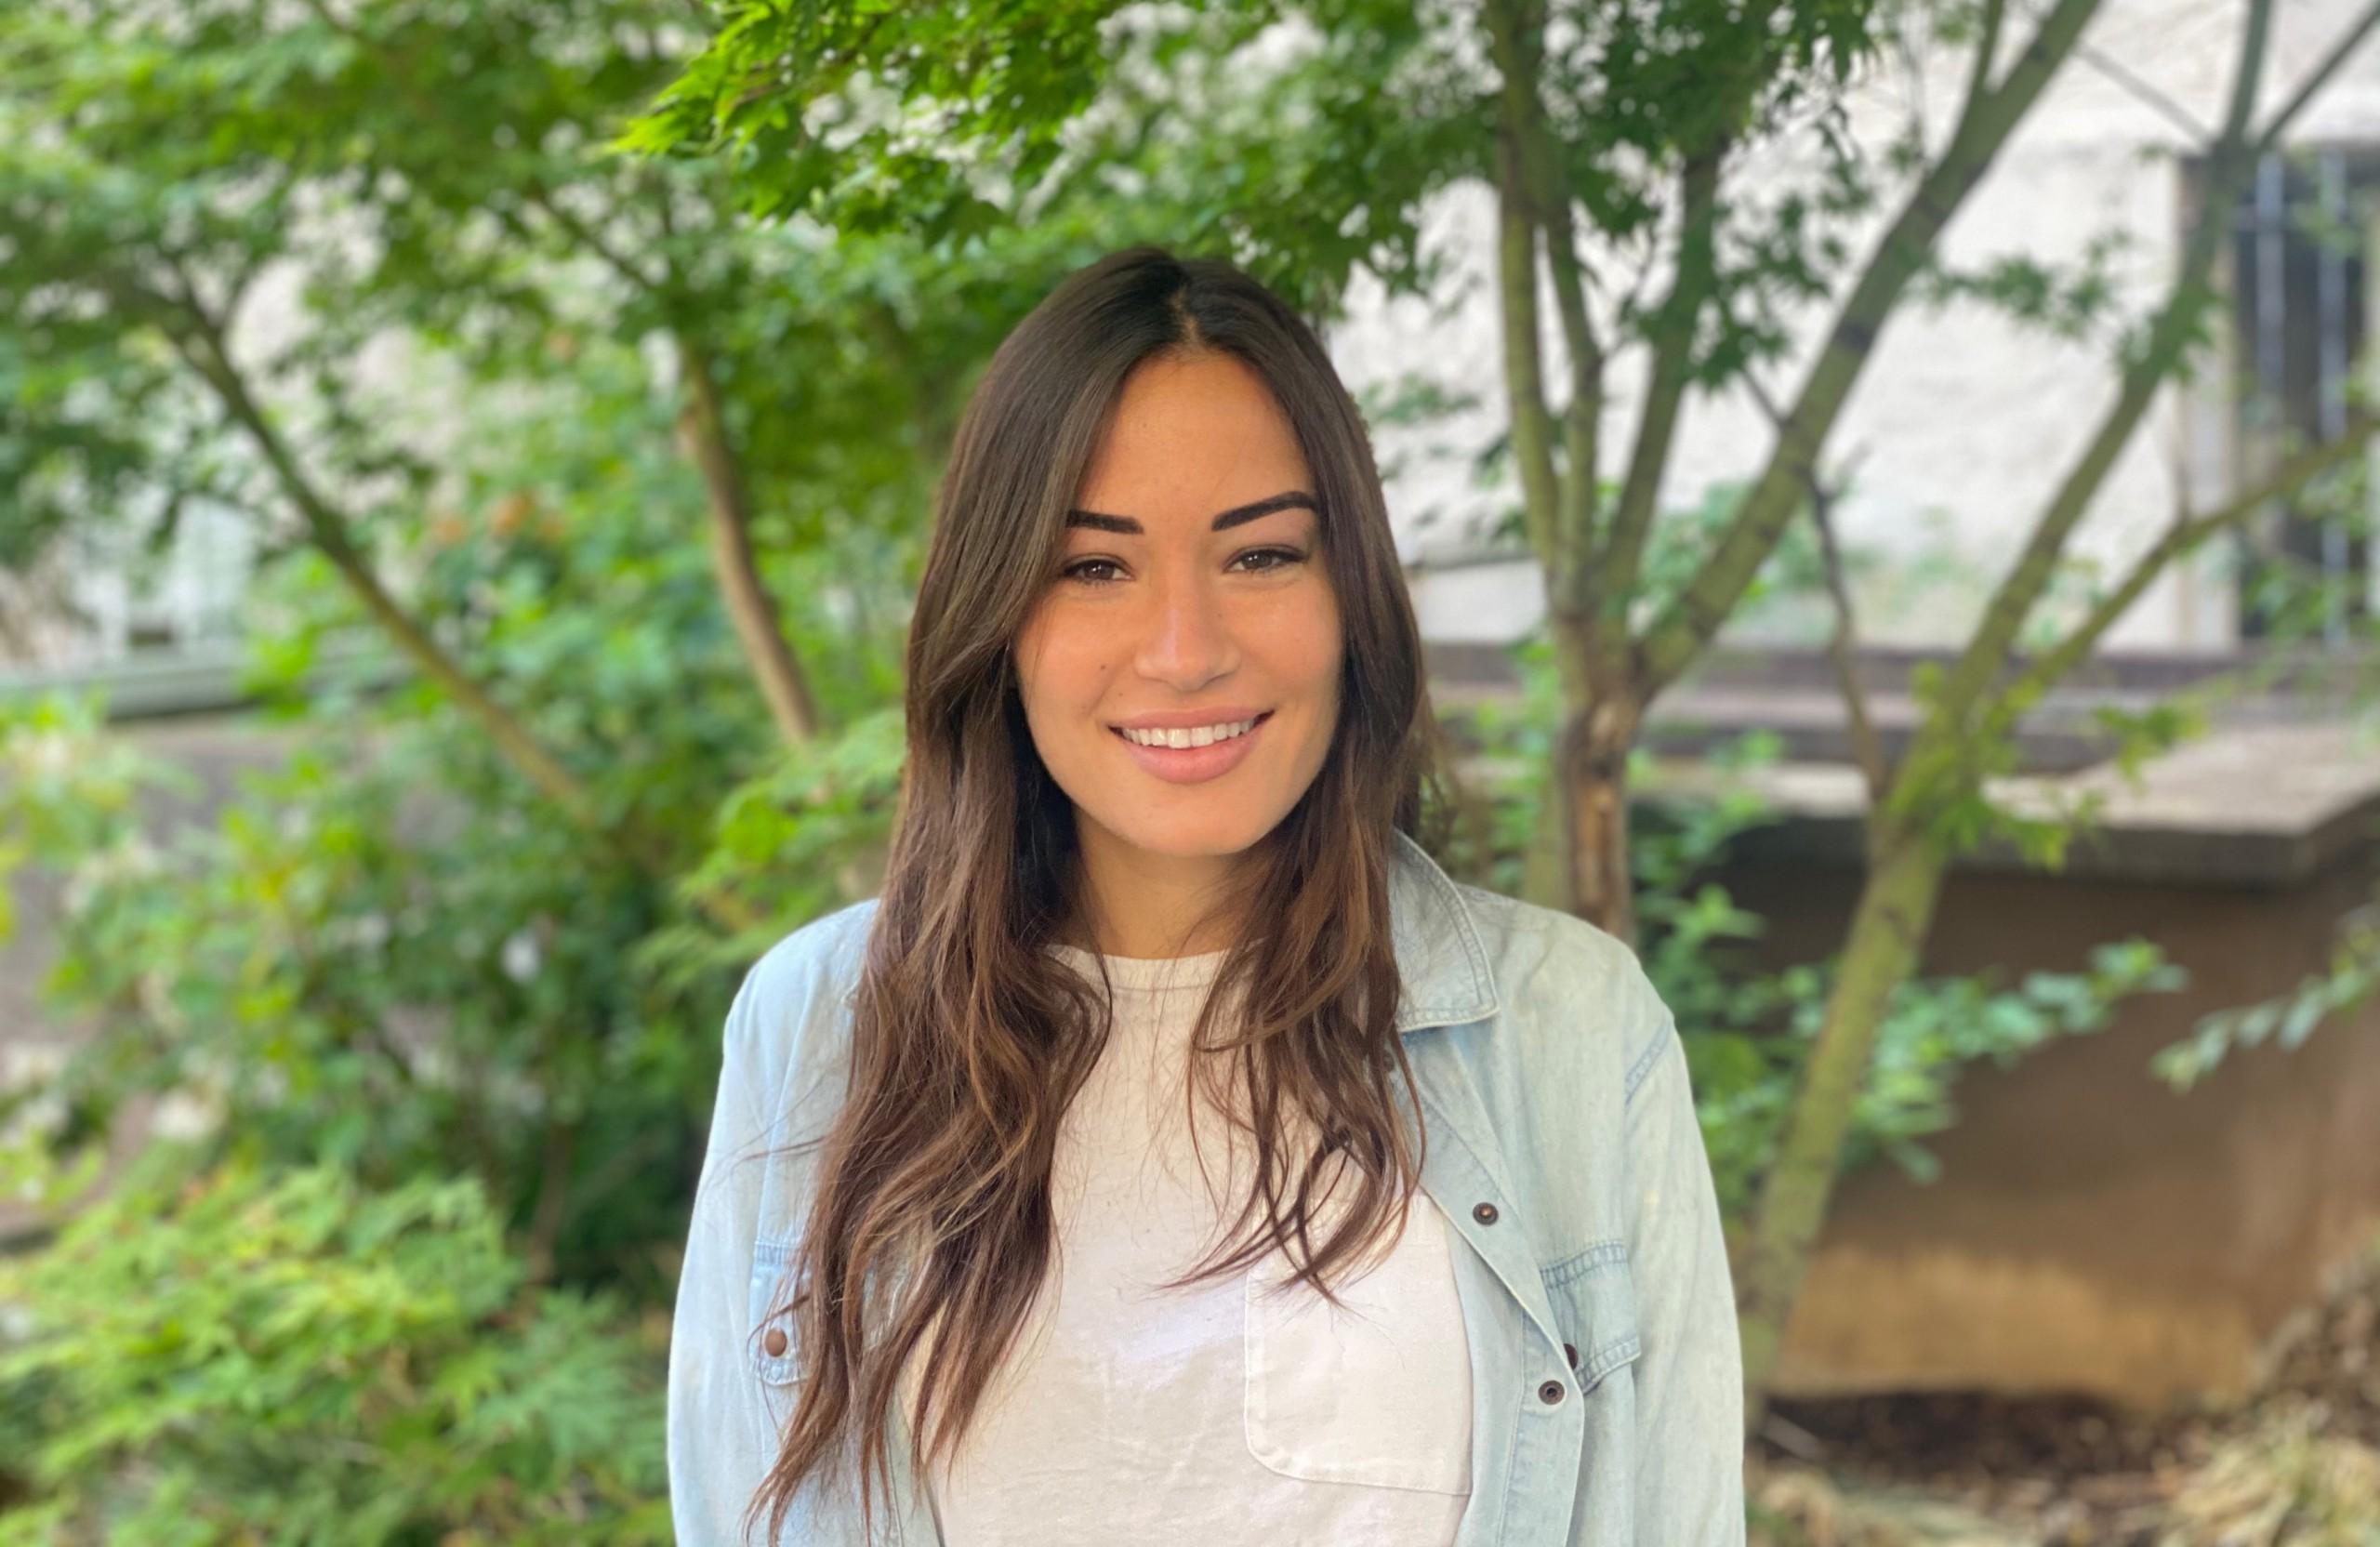 Sarah-Line Attlan